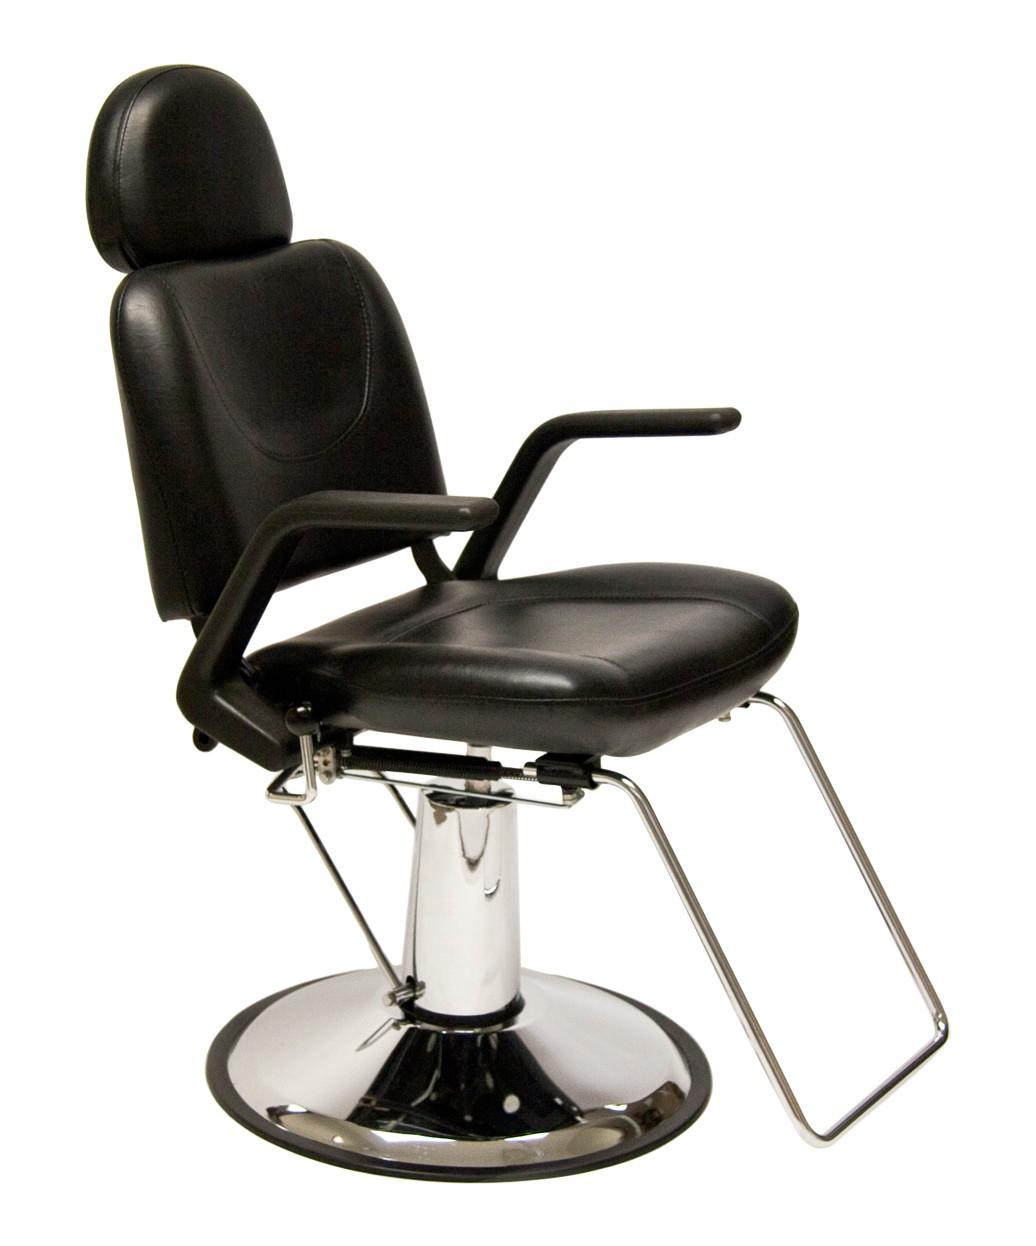 Hydraulic Wheelchair Seat : Sue all purpose hydraulic salon chair with headrest